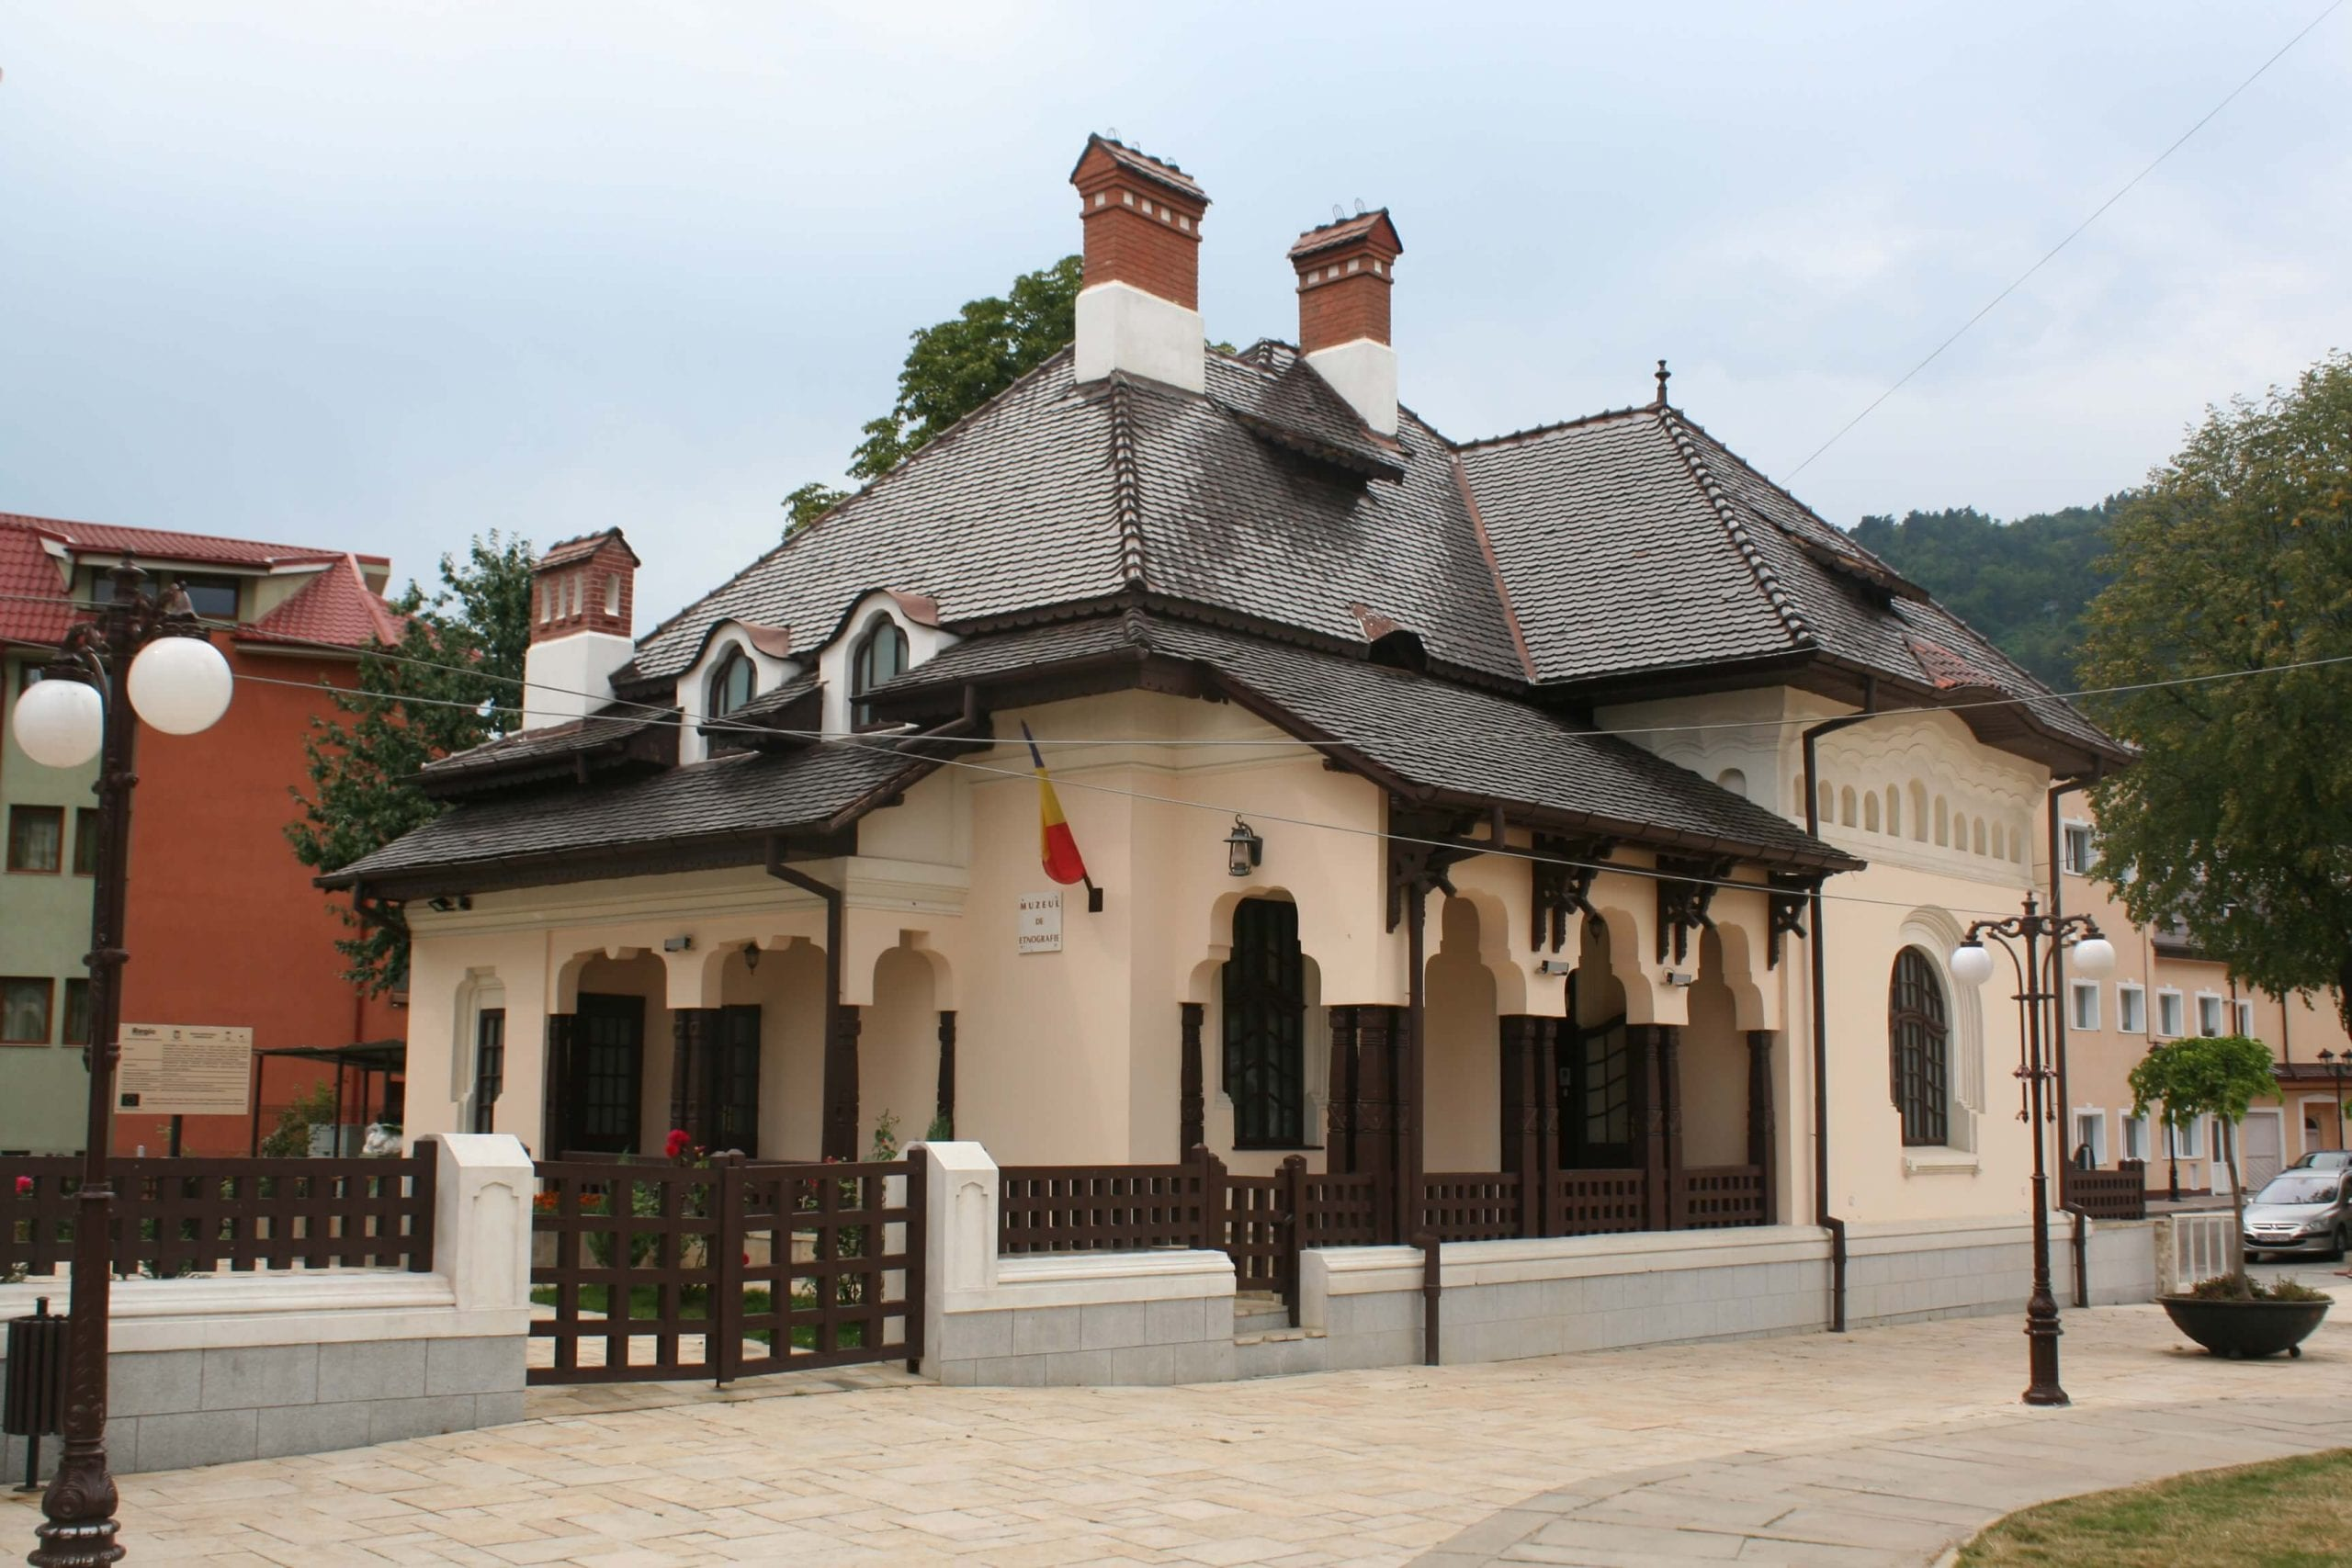 muzeul-de-etnografie - Clement Apartments - Cazare Neamt - cniptpiatraneamt.ro